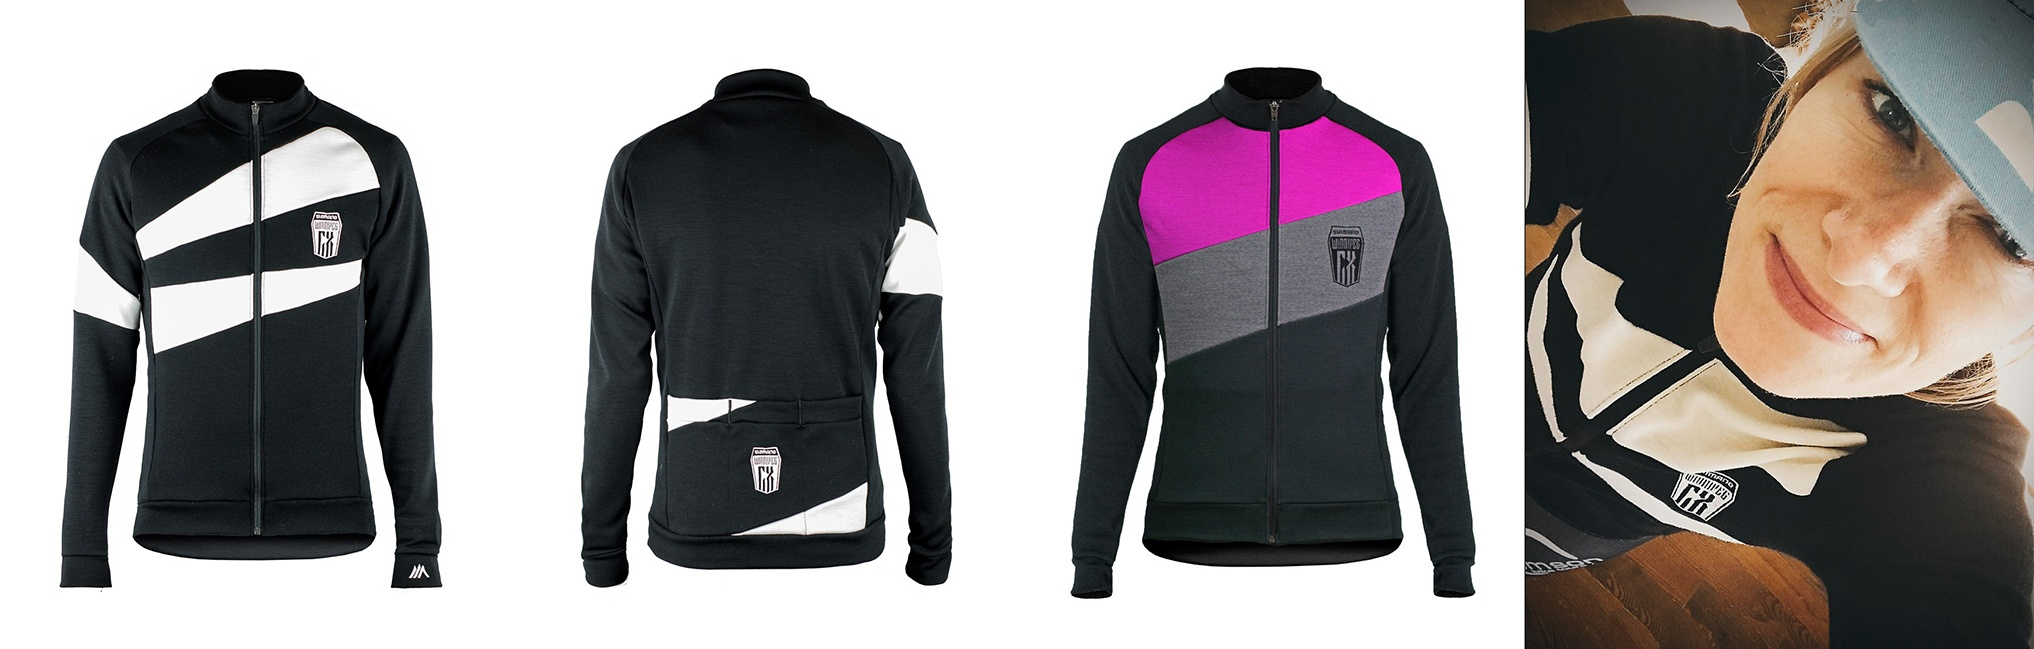 CMX Cyclocross Nationals jersey